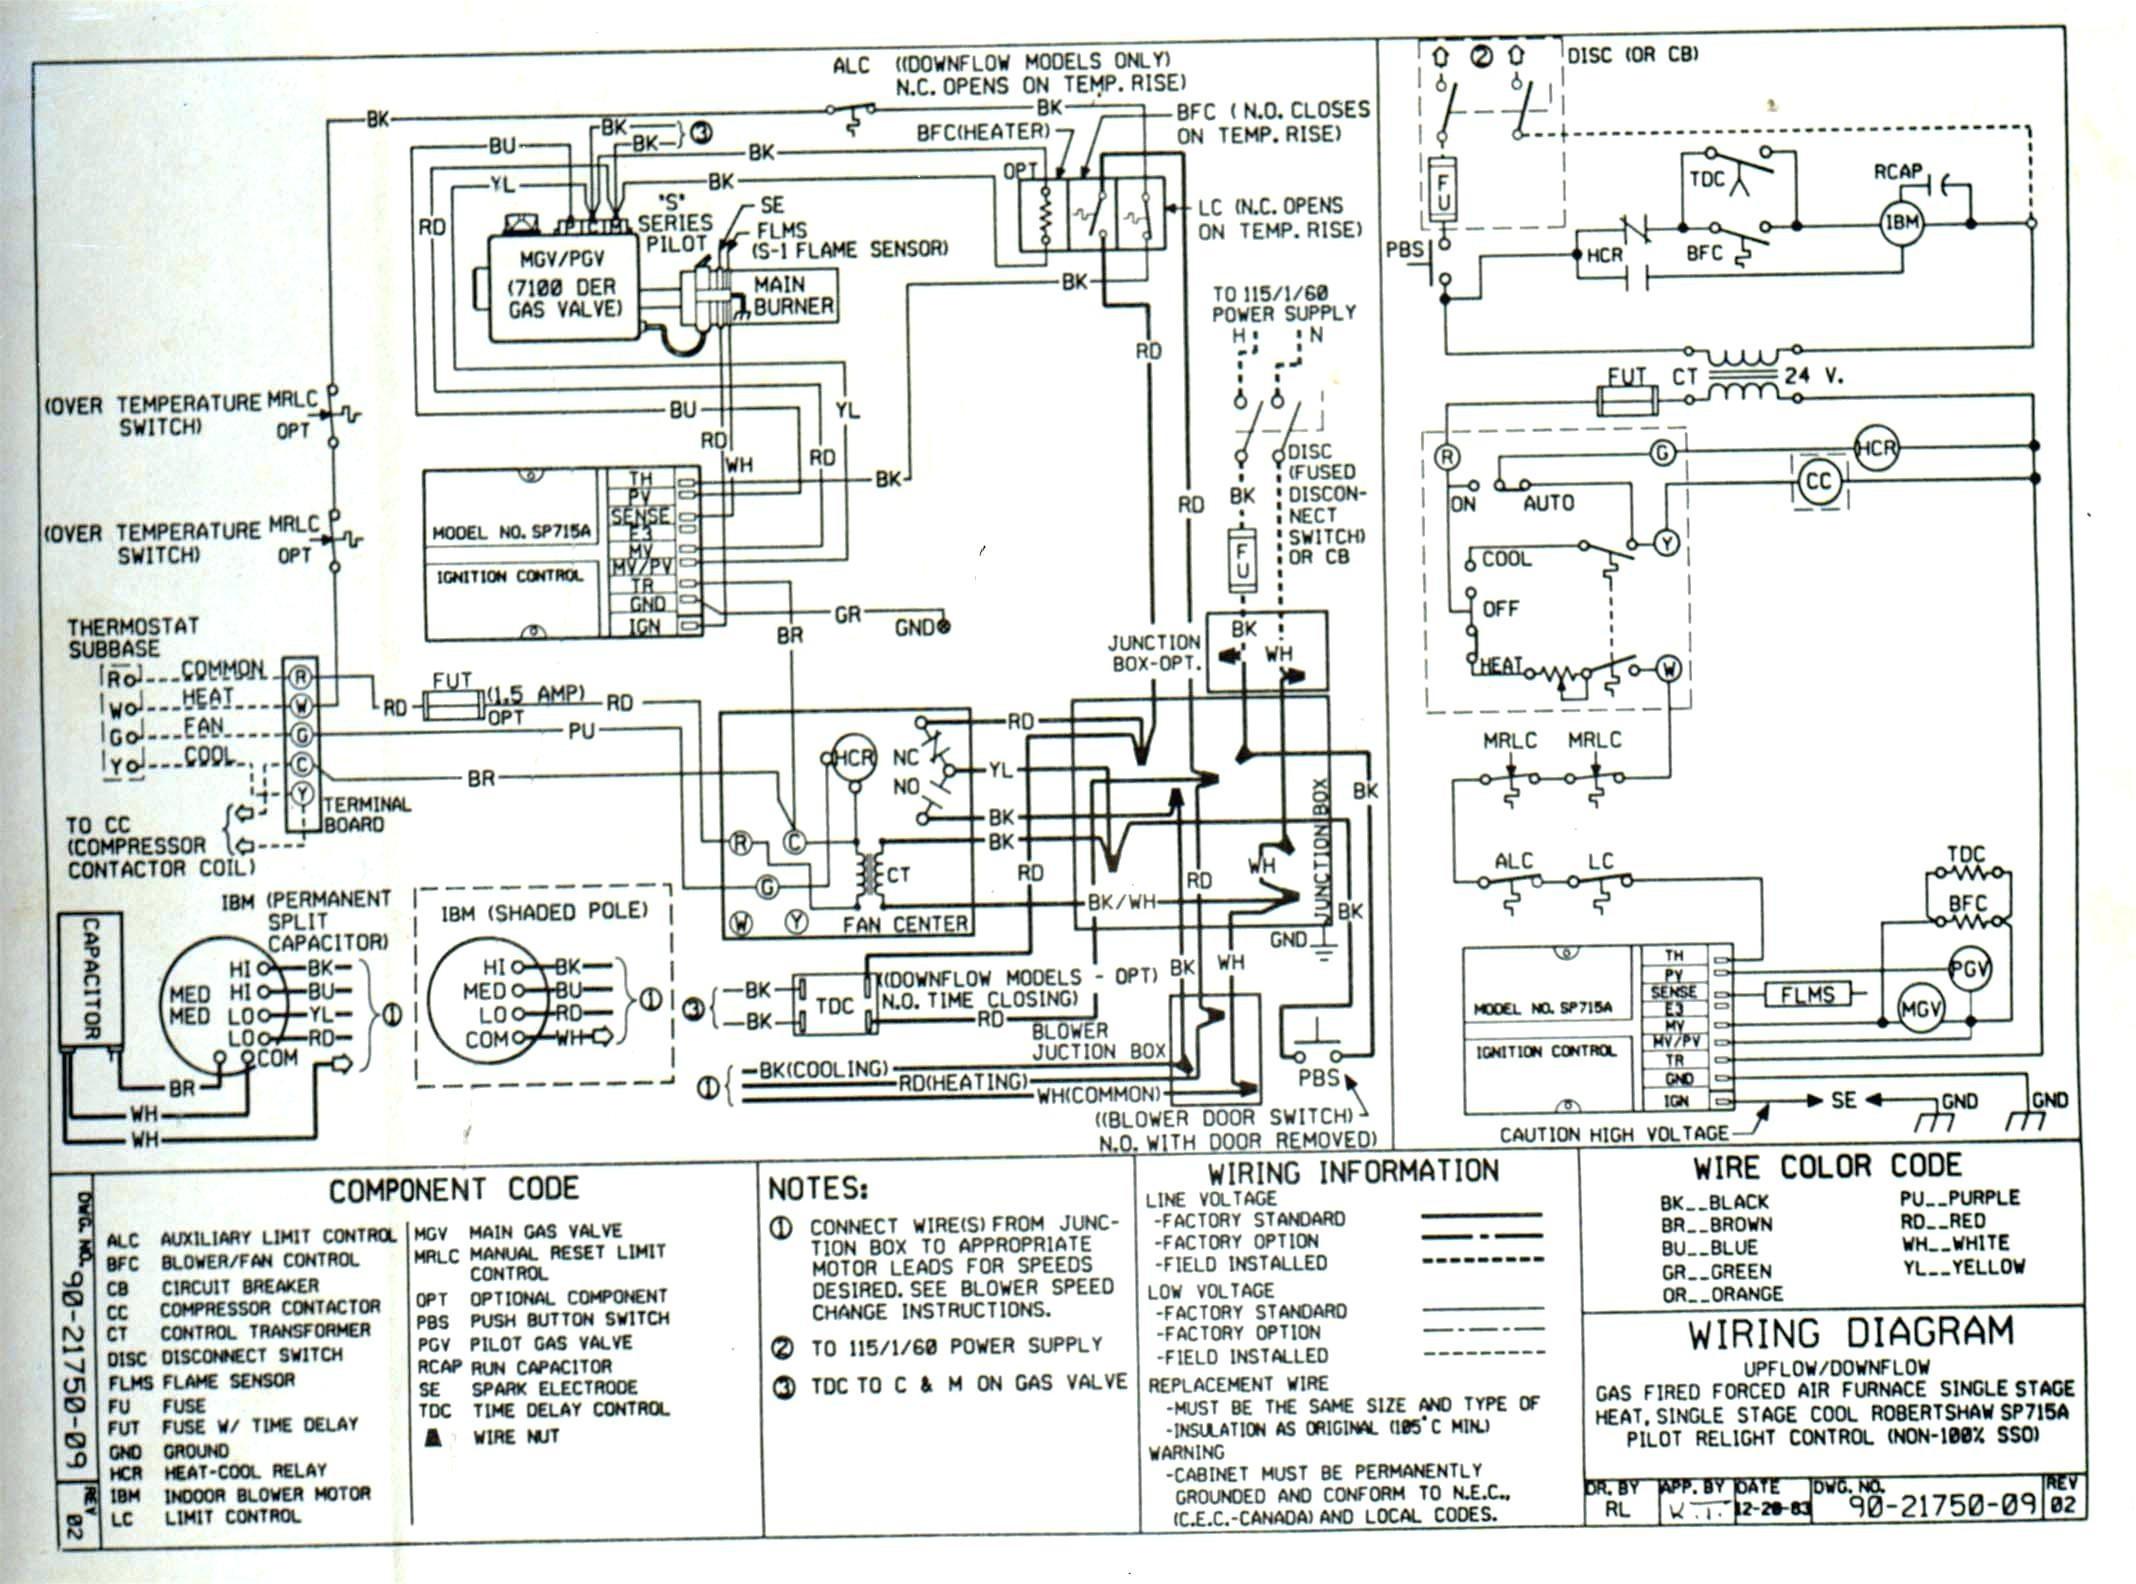 aaon rooftop units wiring diagram trane ac wiring diagram gallery wiring diagram rh visithoustontexas org crane schematic symbols carrier schematic symbols 3o